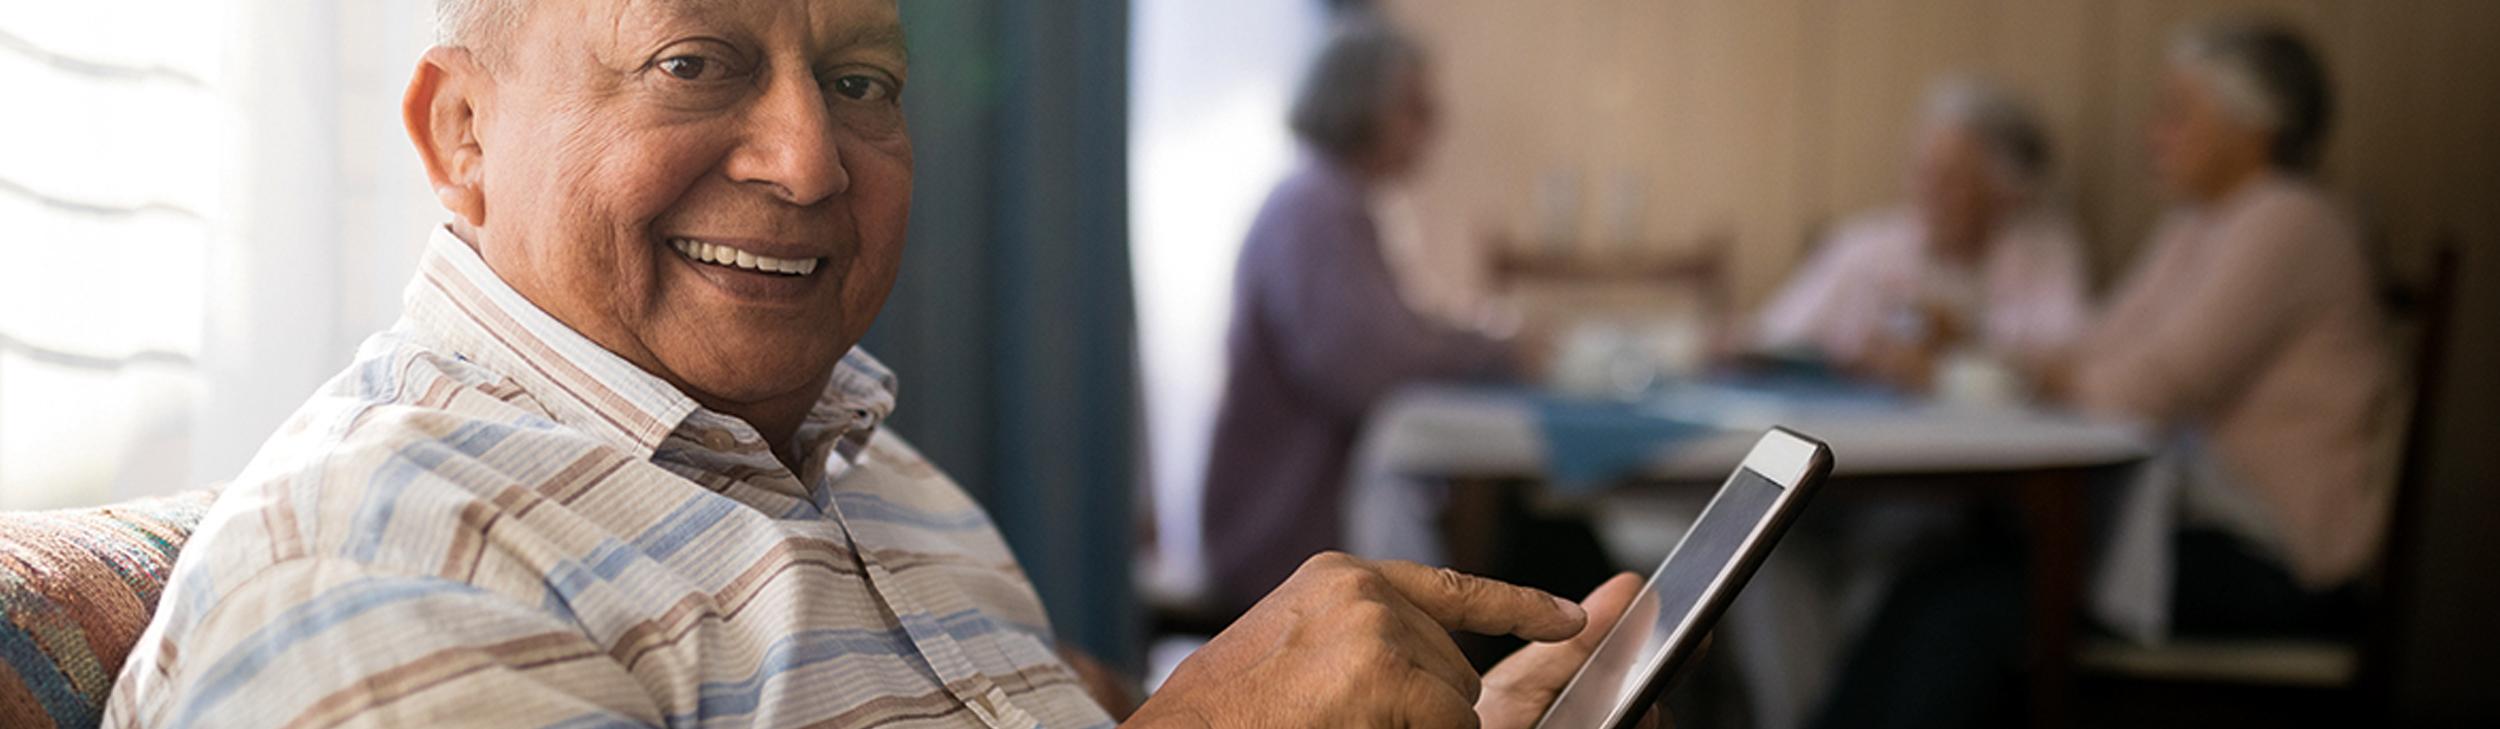 Older man on tablet smiles to camera